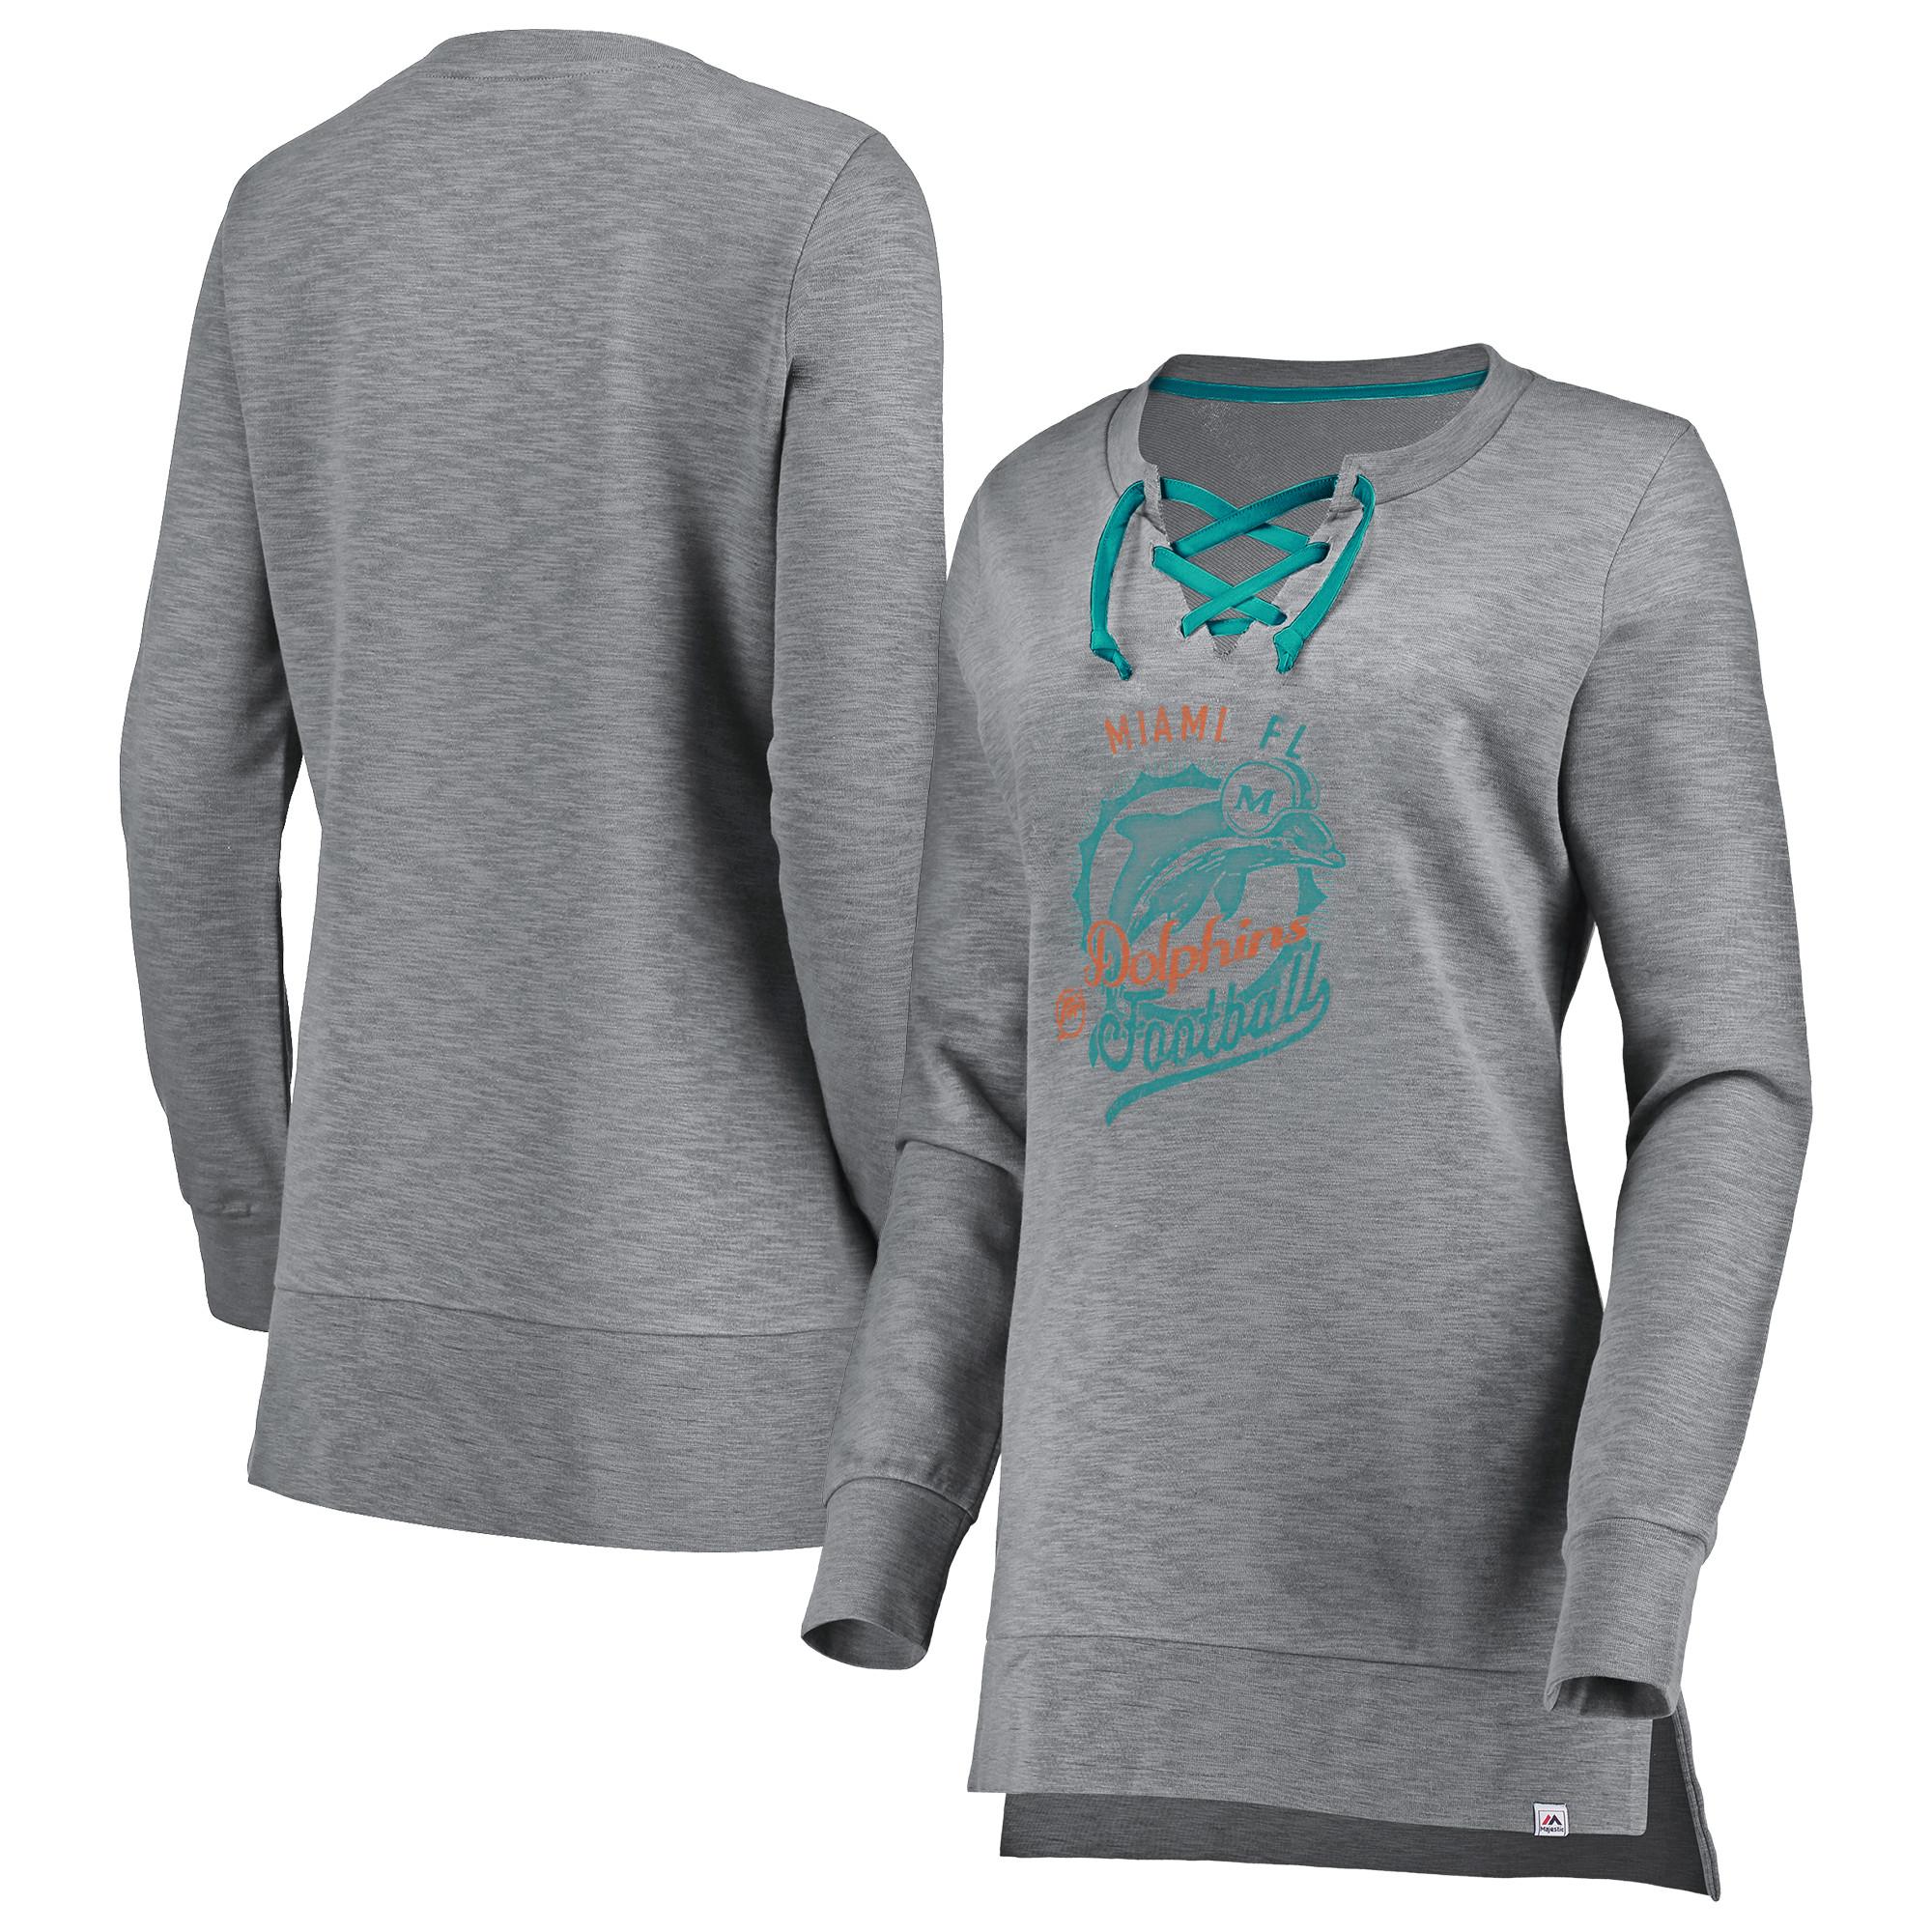 Miami Dolphins Majestic Women's Historic Hyper Lace-Up Tunic Sweatshirt - Heathered Gray